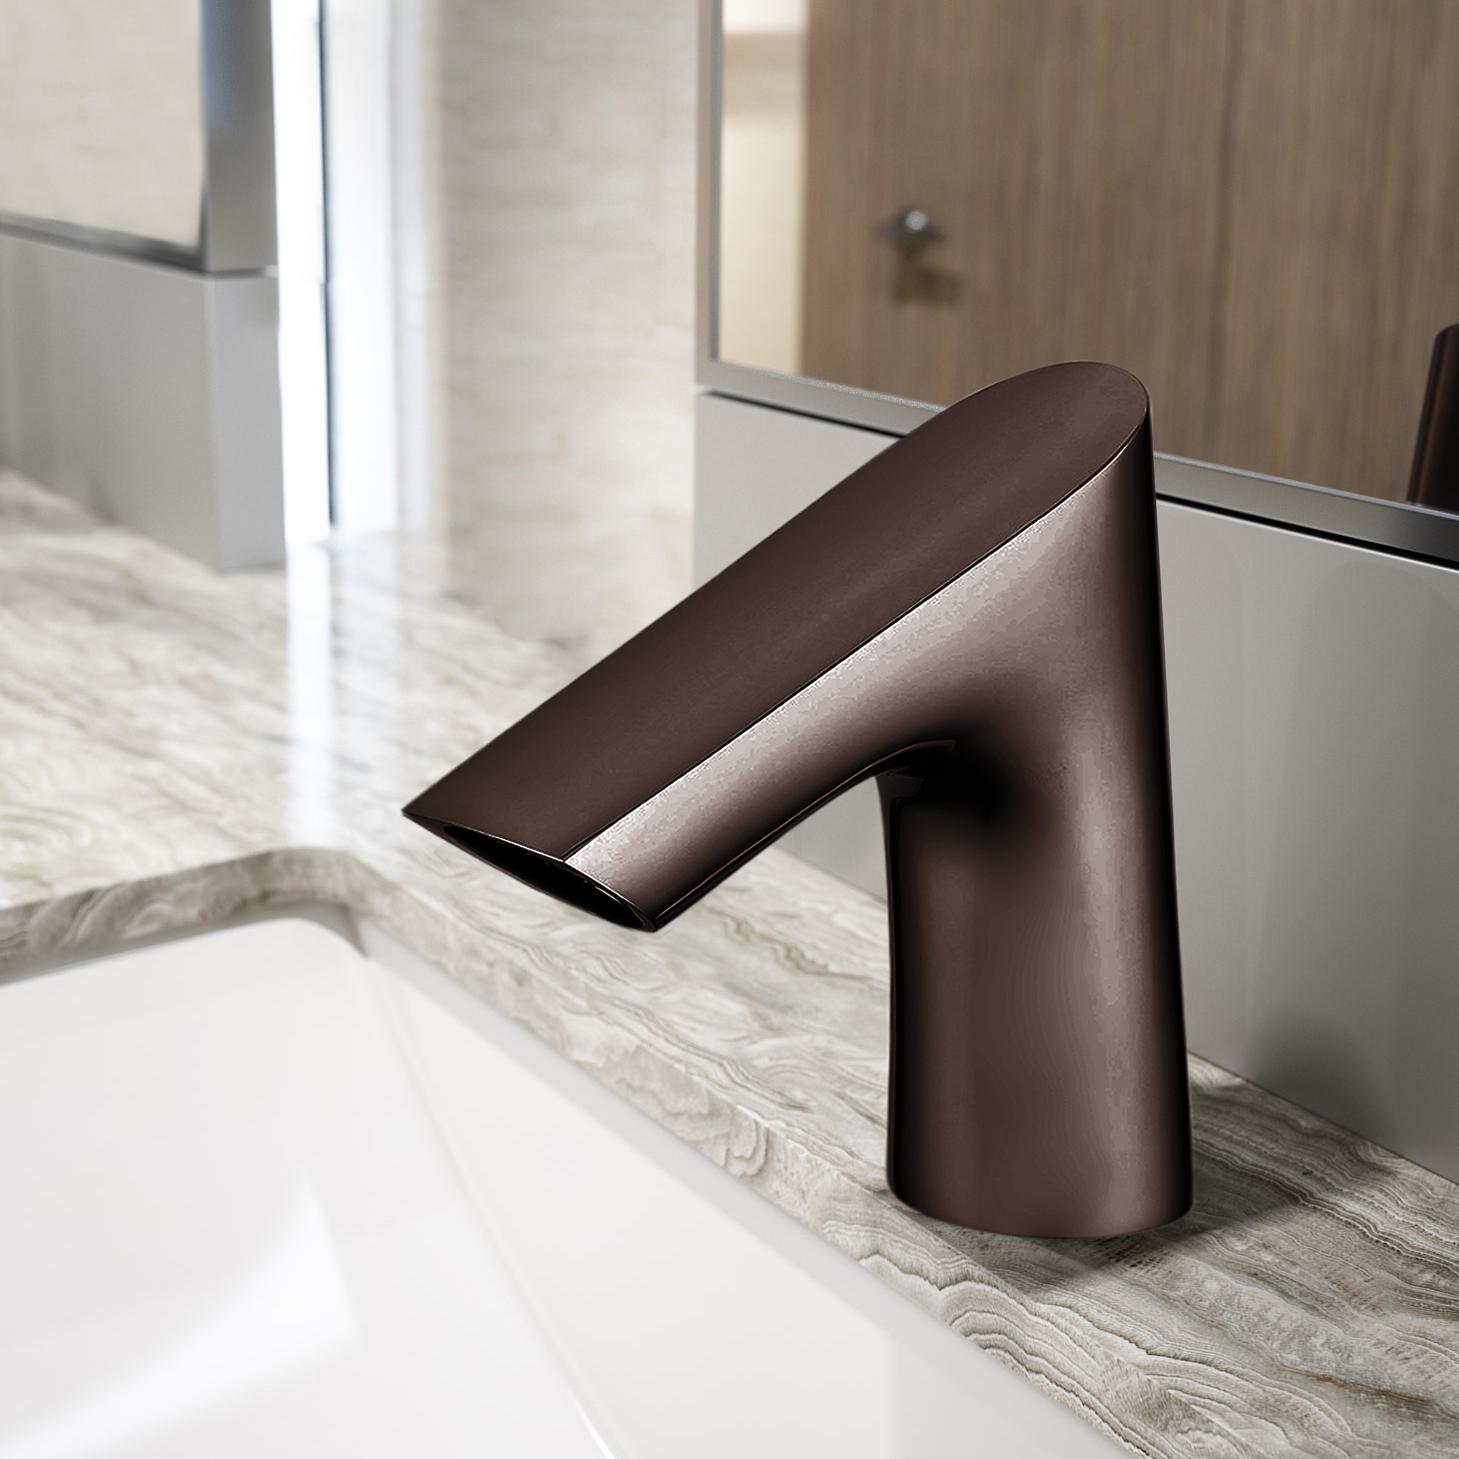 Fontana Commercial Light Oil Rubbed Bronze Touch less Automatic Sensor Faucet